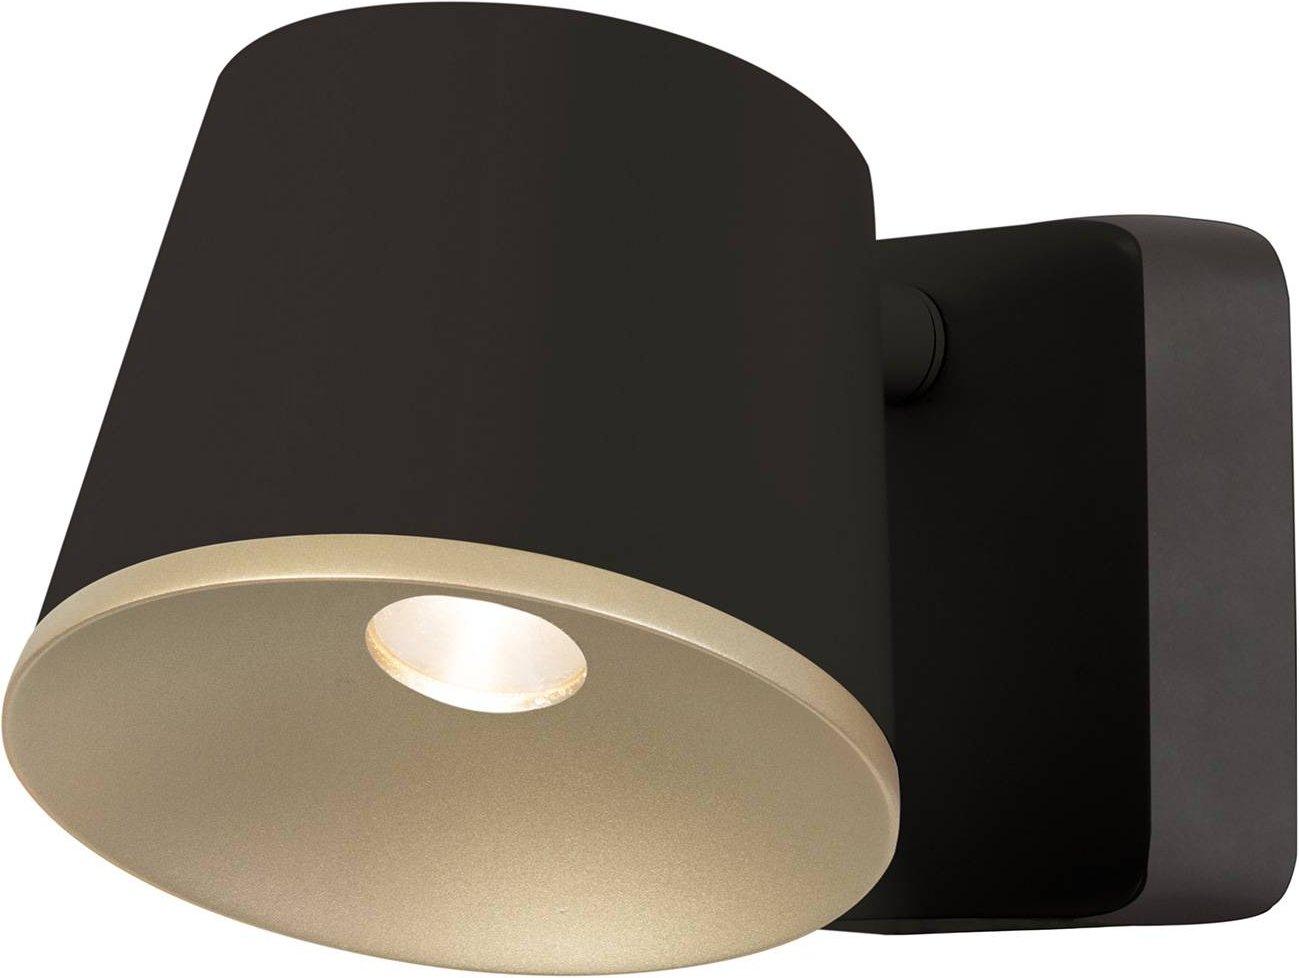 LEDS C4 Drone LED wall light adjustable  brown